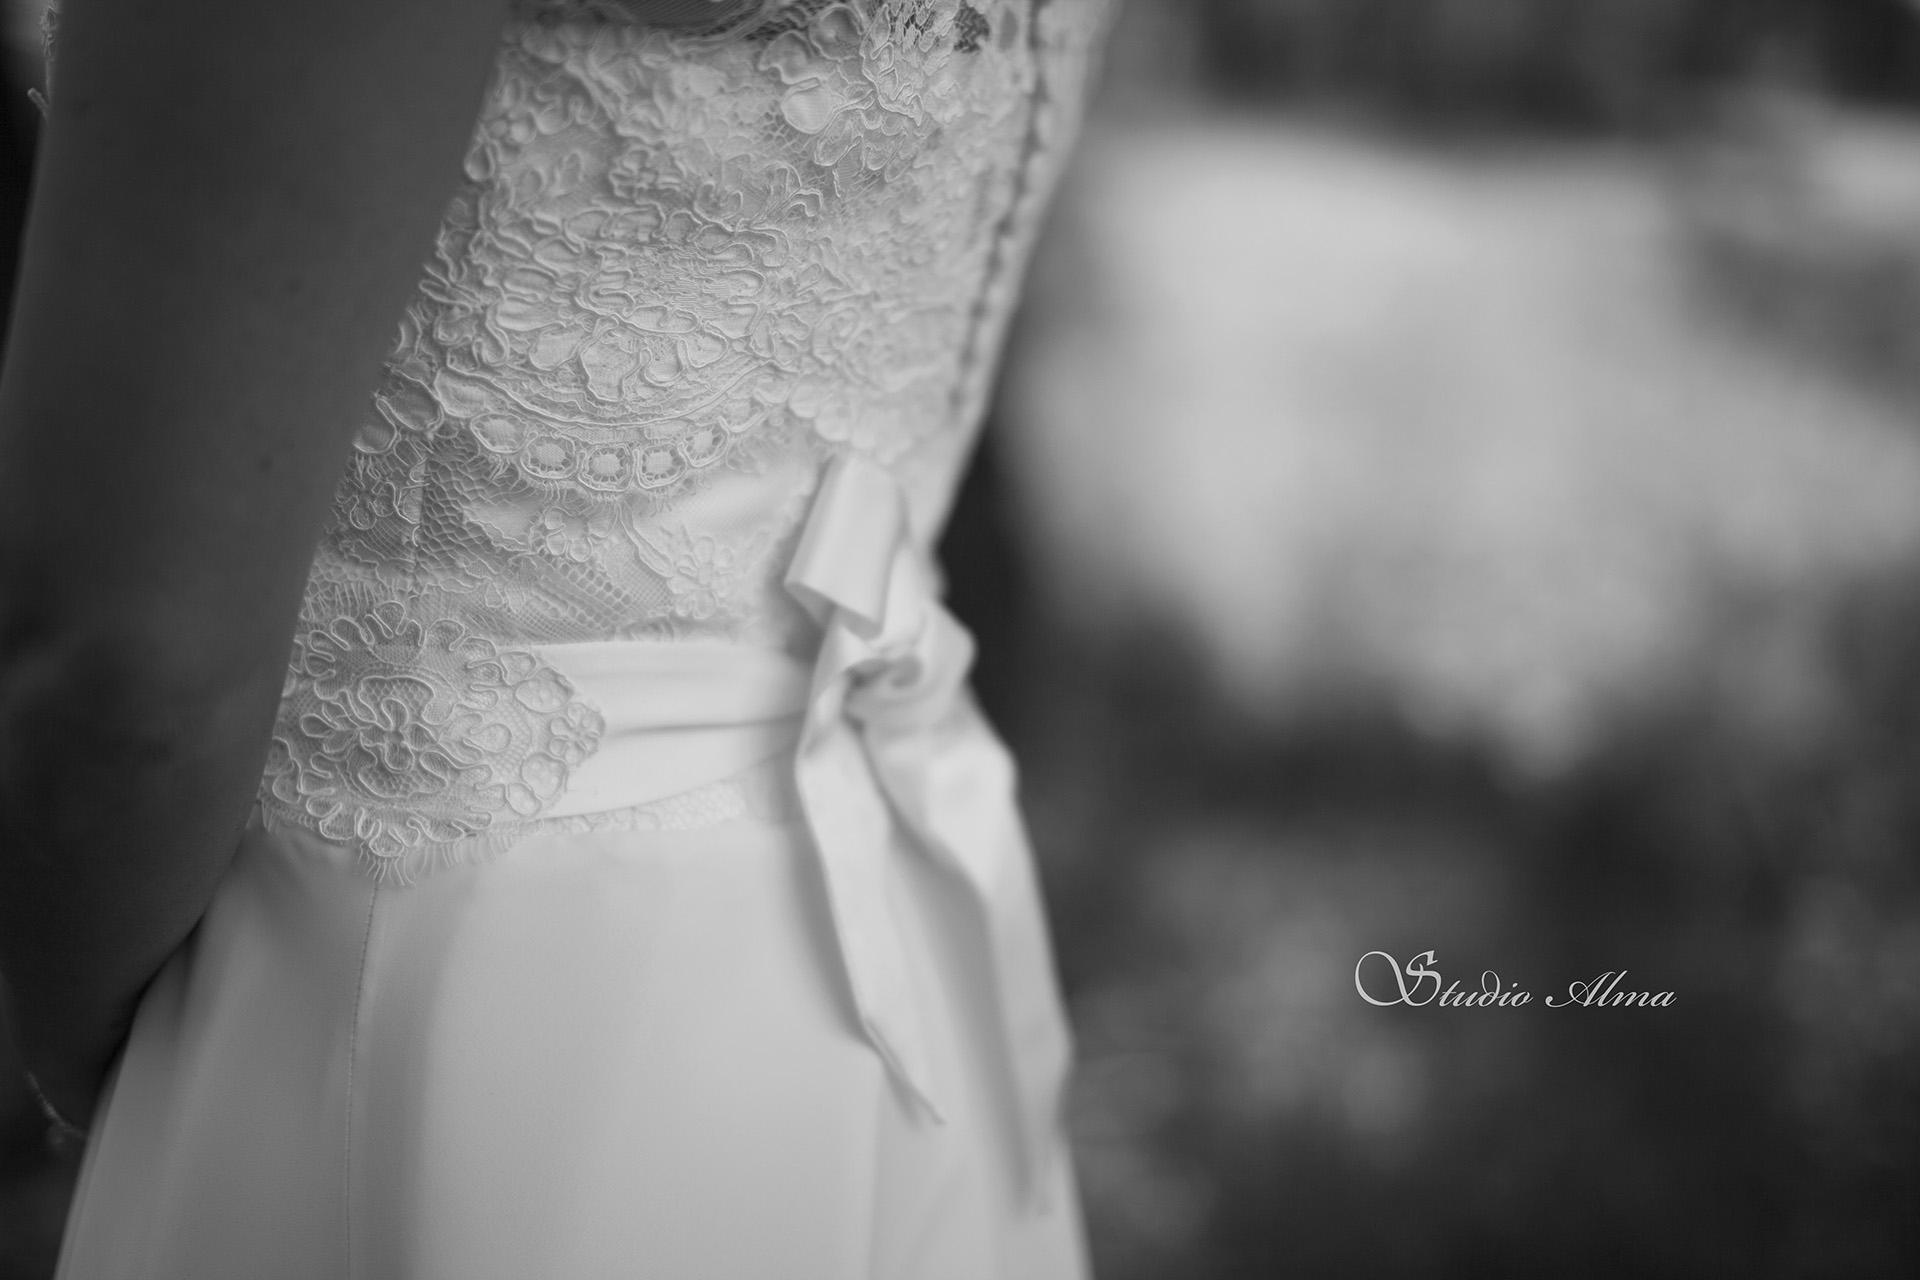 detaljer-brud-studioalma-wedding